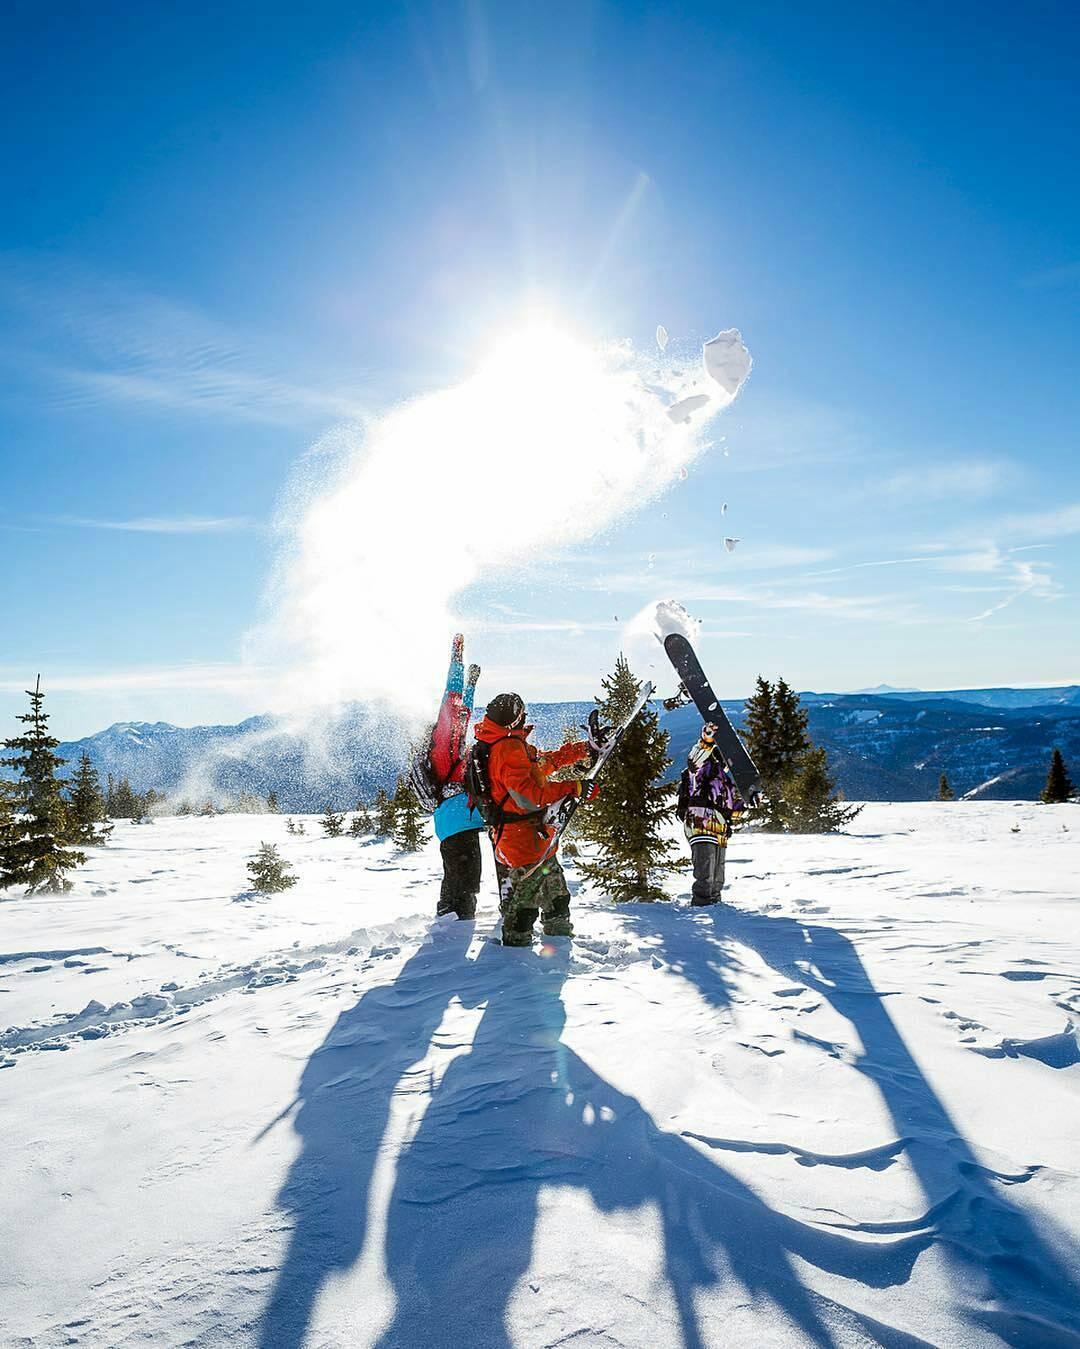 Despidiendo a la nieve con amigos. #neffsnow @prof_daggs #neffargentina #foreverfun